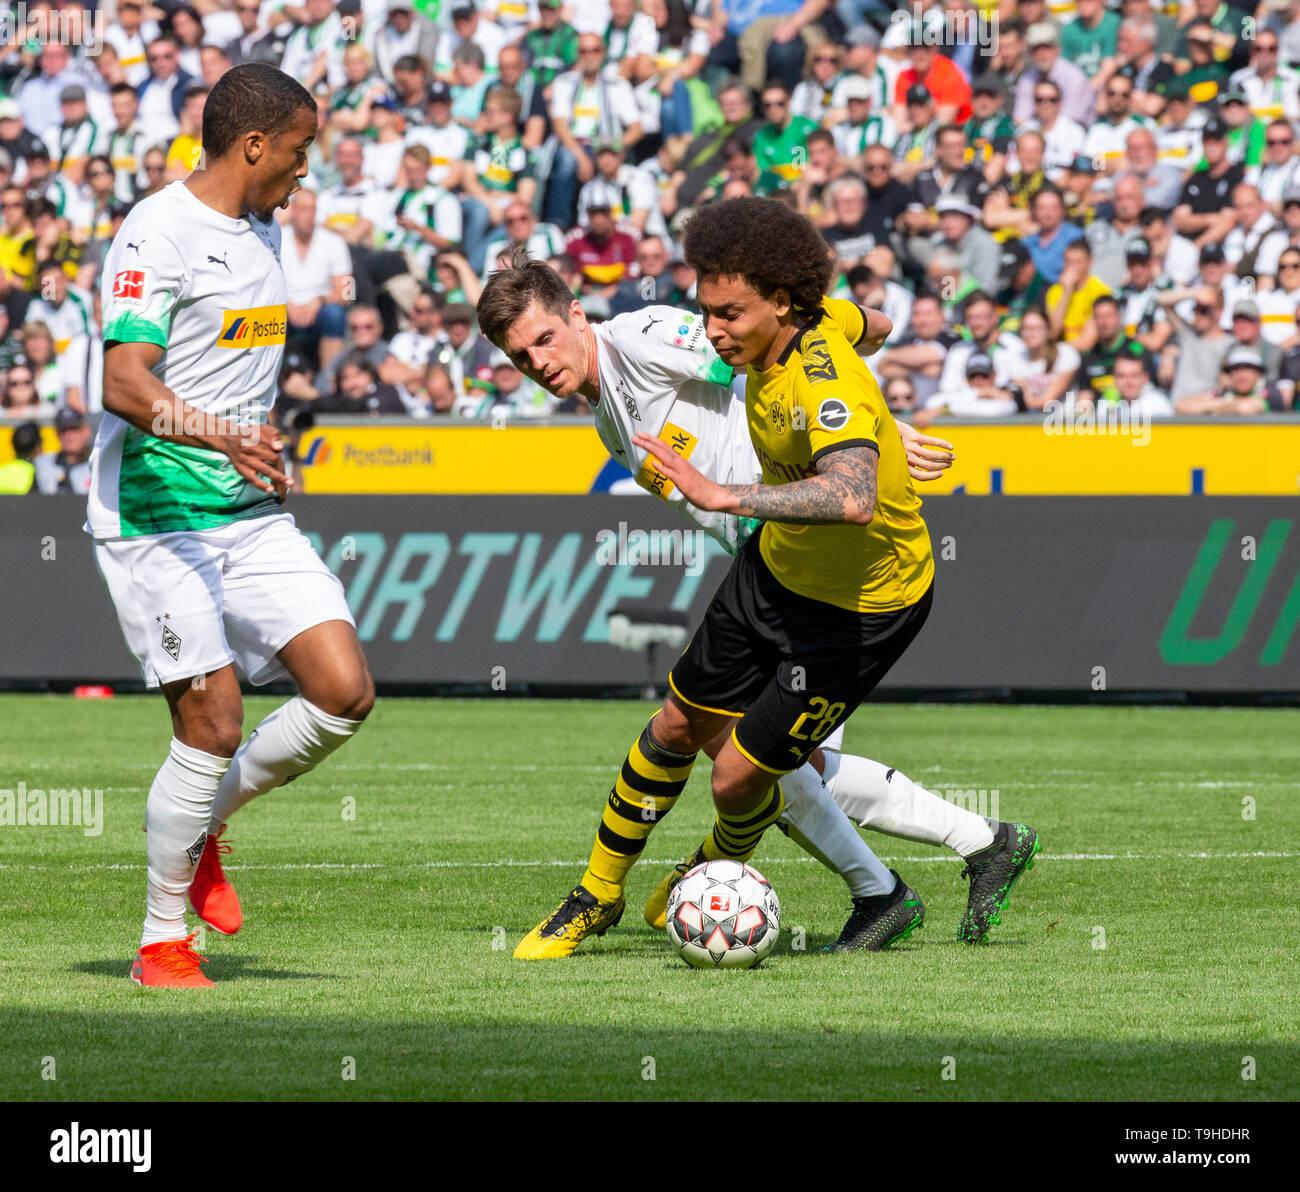 sports, football, Bundesliga, 2018/2019, Borussia Moenchengladbach vs. BVB Borussia Dortmund 0-2, Stadium Borussia Park, scene of the match, f.l.t.r. Alassane Plea (MG), Jonas Hofmann (MG), Axel Witsel (BVB), DFL REGULATIONS PROHIBIT ANY USE OF PHOTOGRAPHS AS IMAGE SEQUENCES AND/OR QUASI-VIDEO - Stock Image